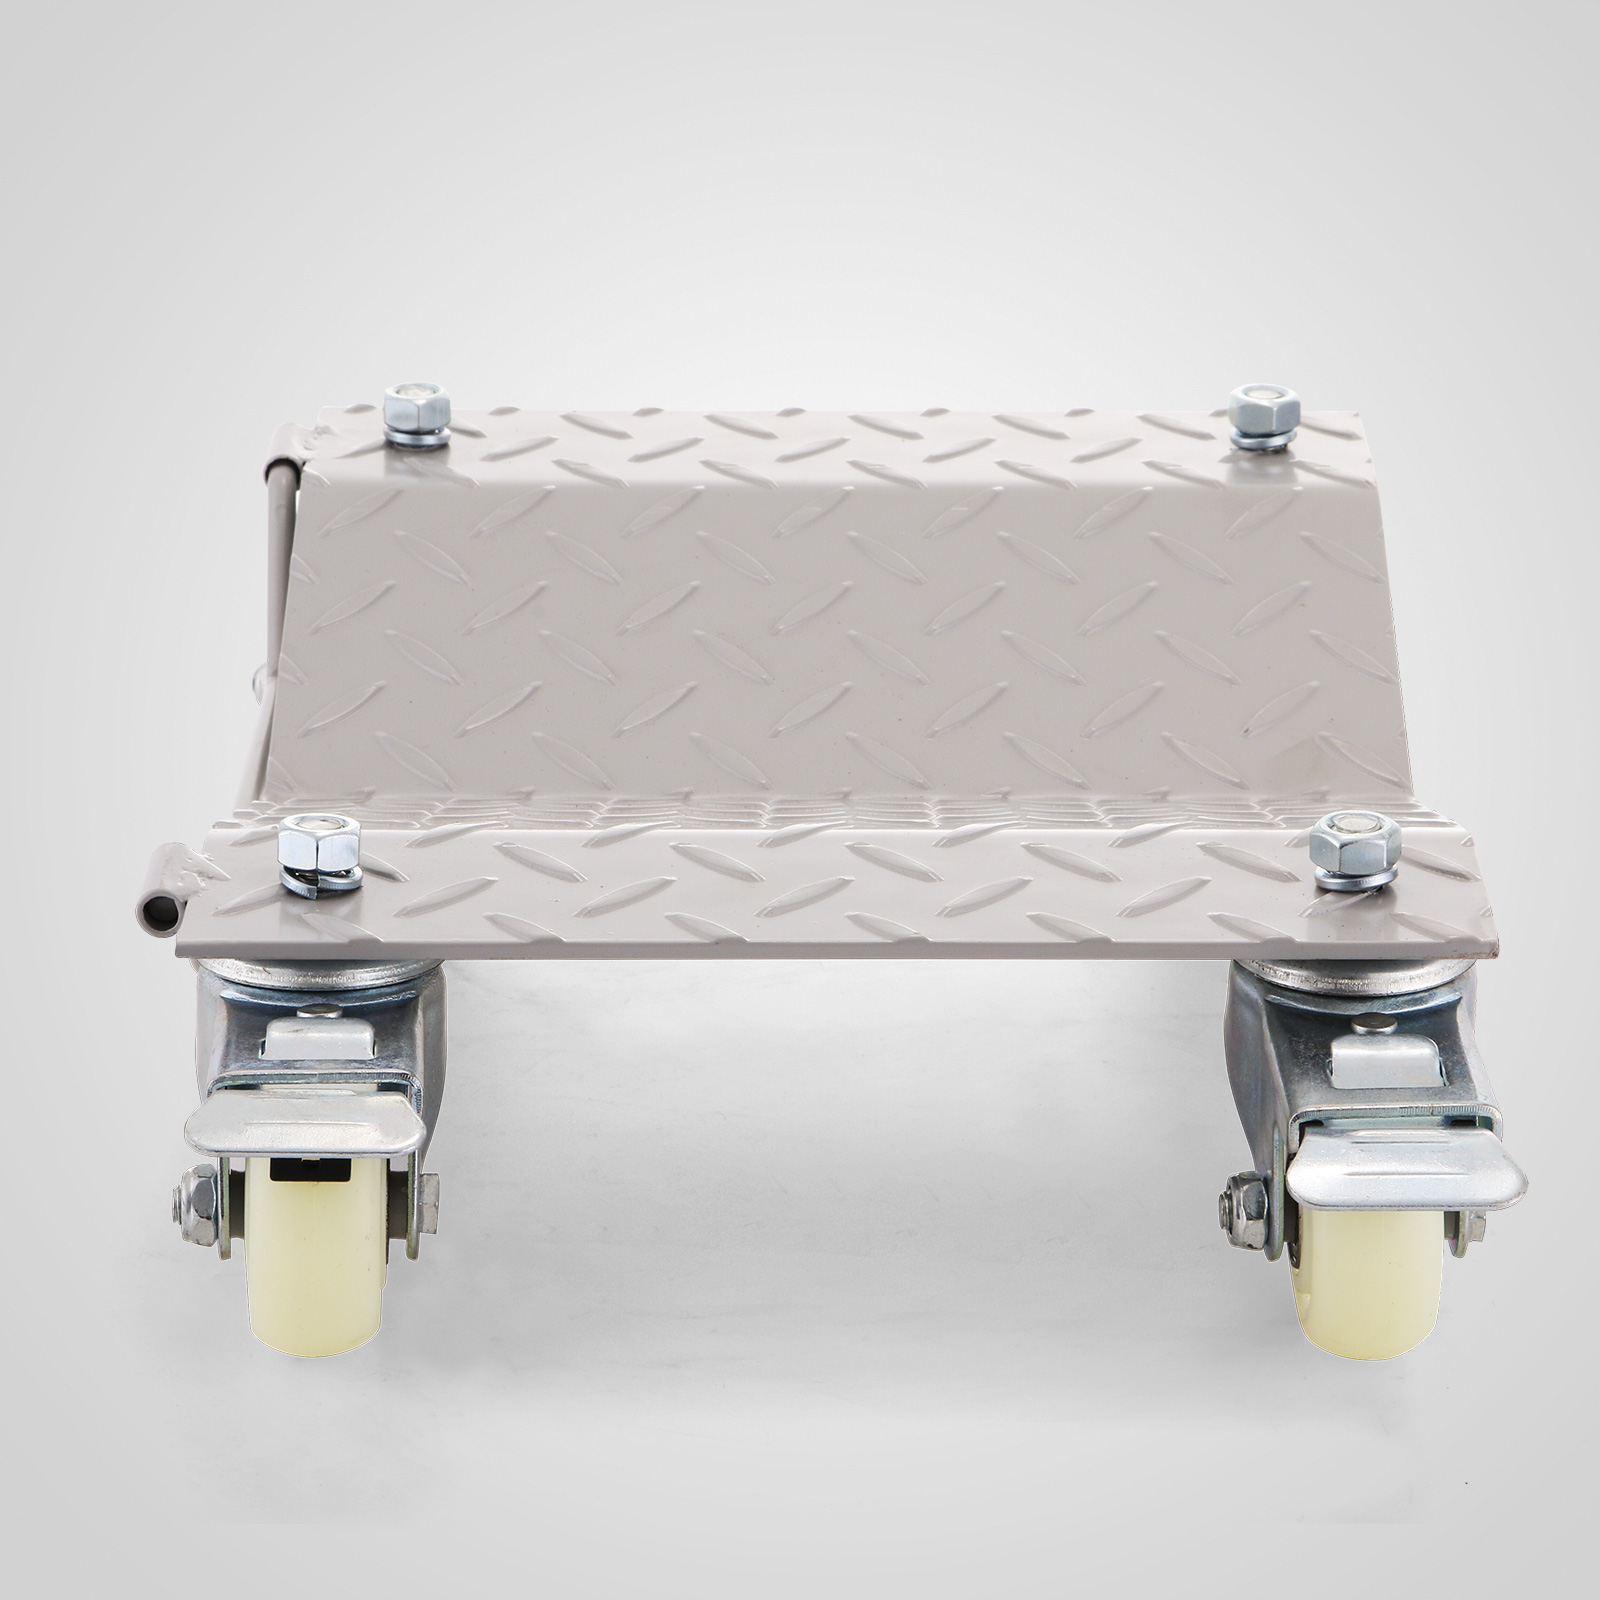 4 st ck rangierhilfe reifenwechsel wagenheber rad. Black Bedroom Furniture Sets. Home Design Ideas